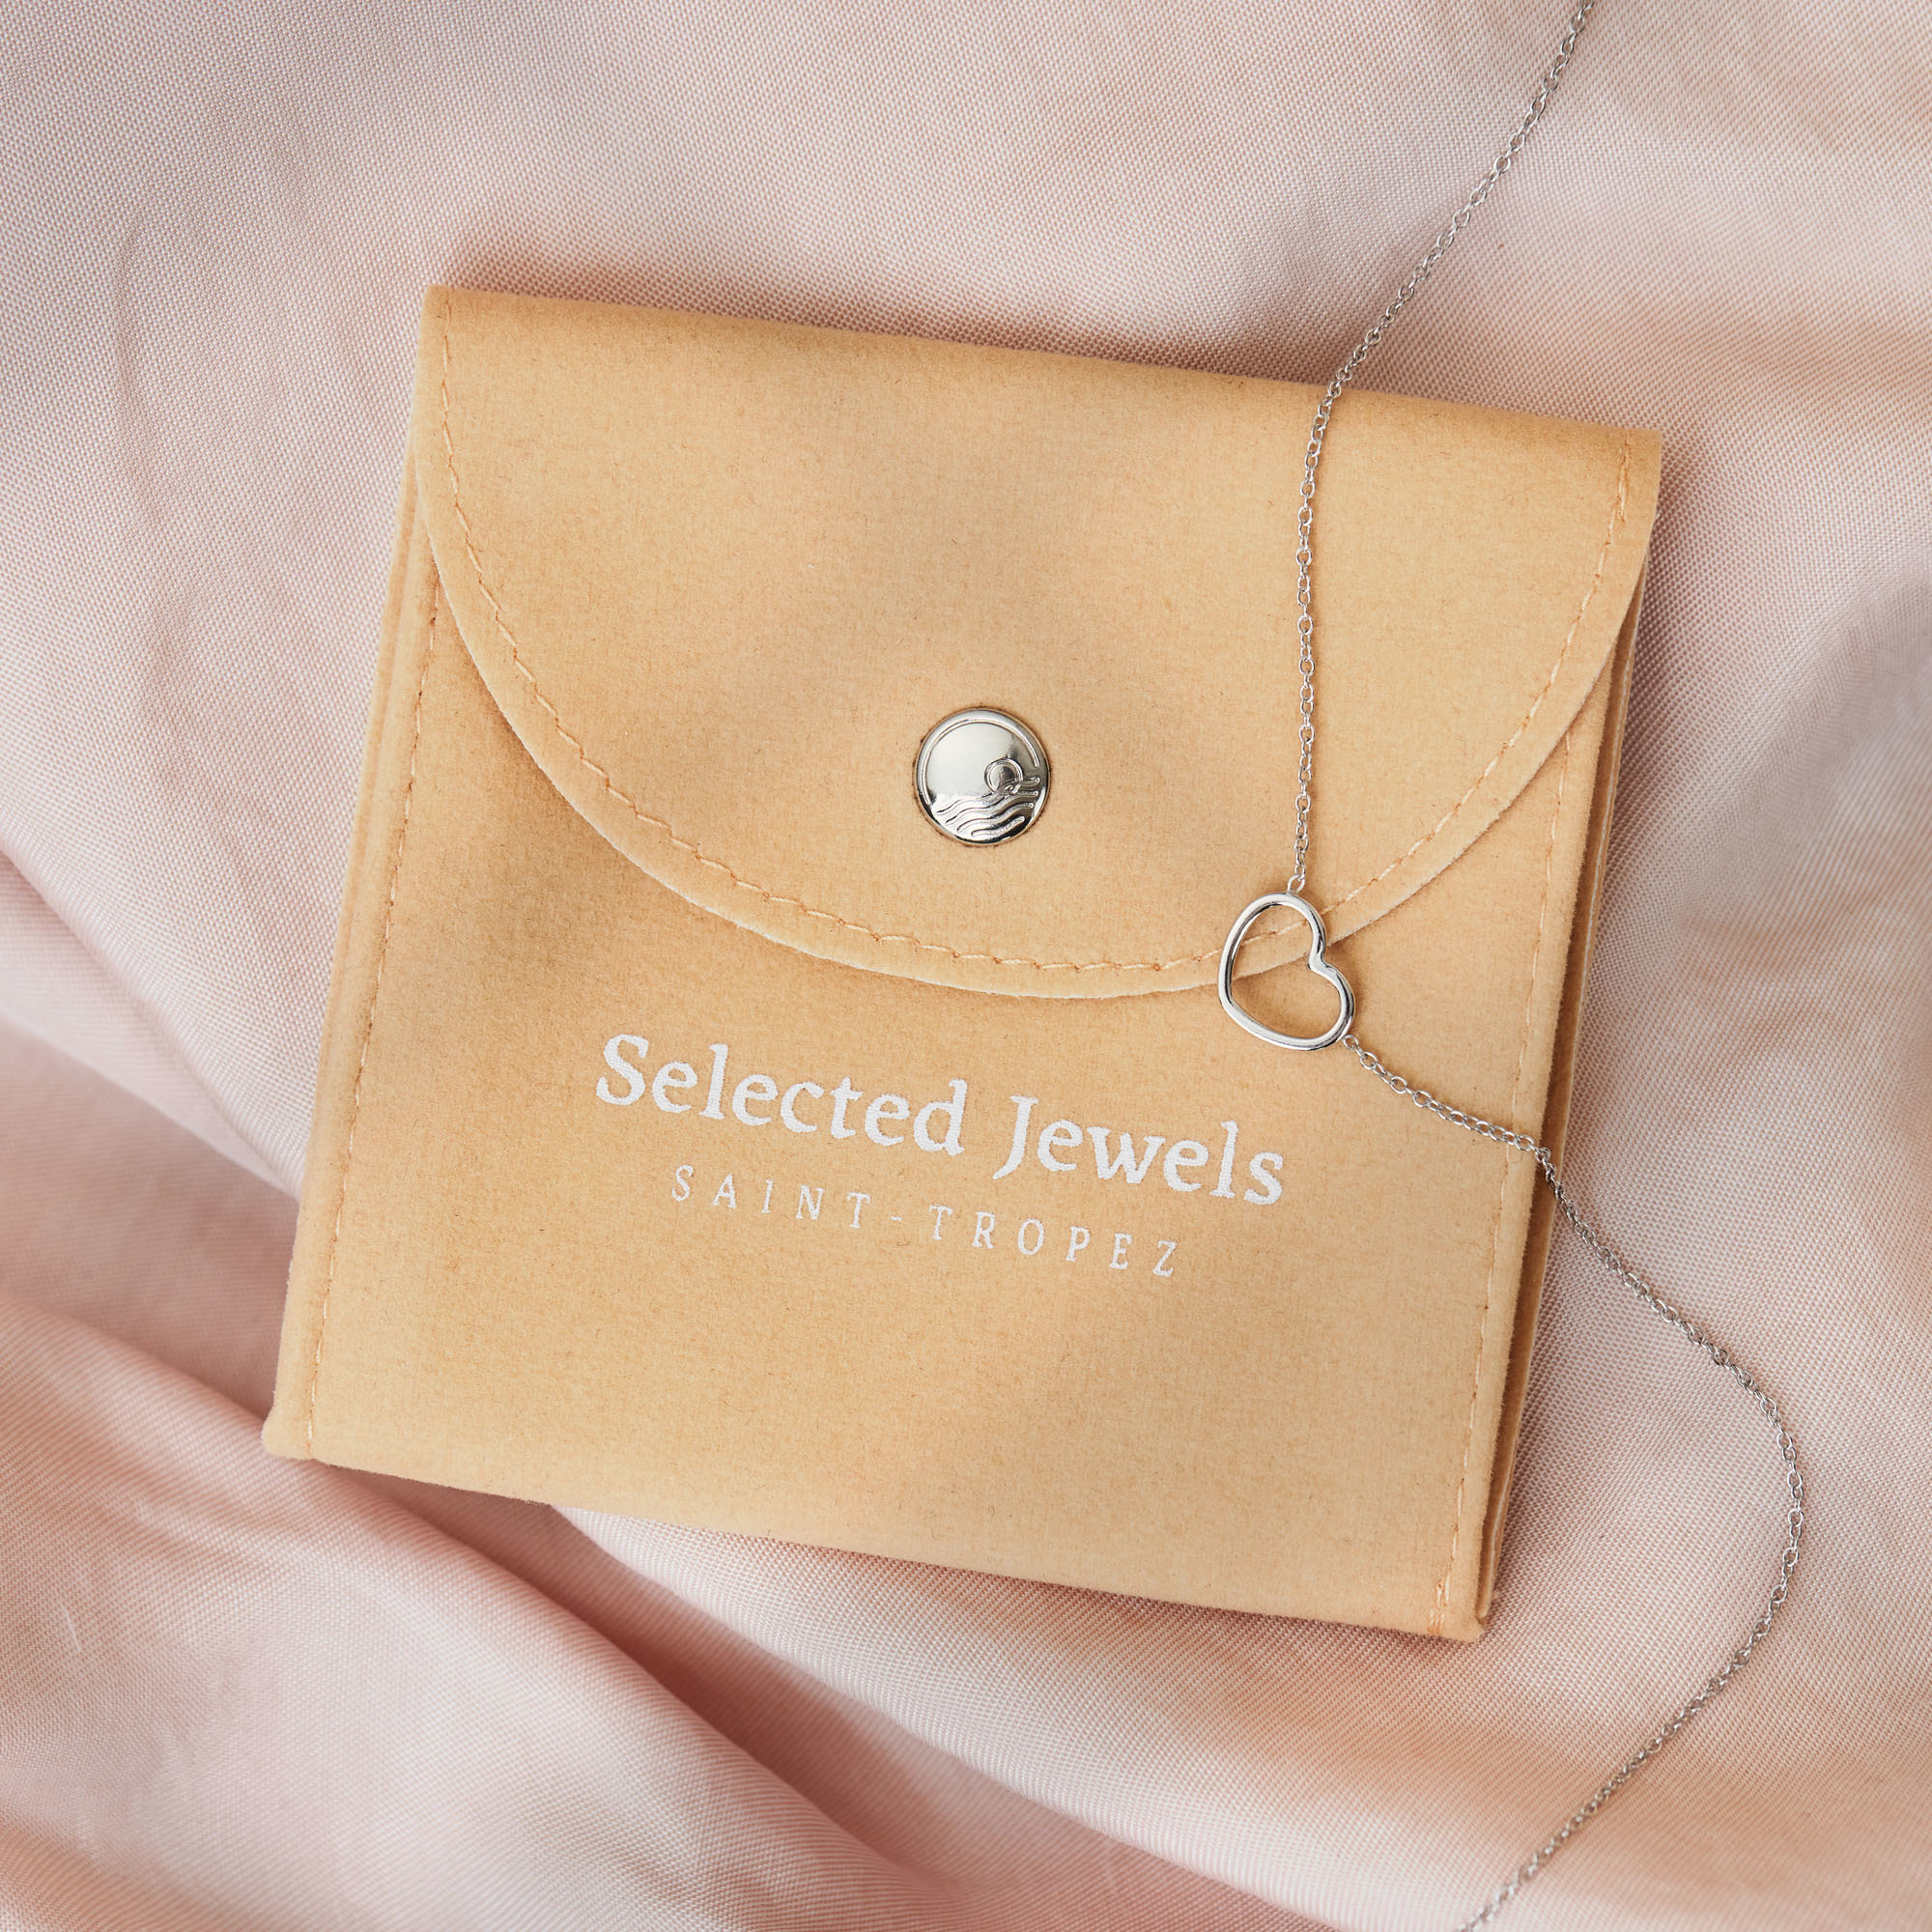 Selected Jewels Julie Emilie infinity armband i 925 sterling silver